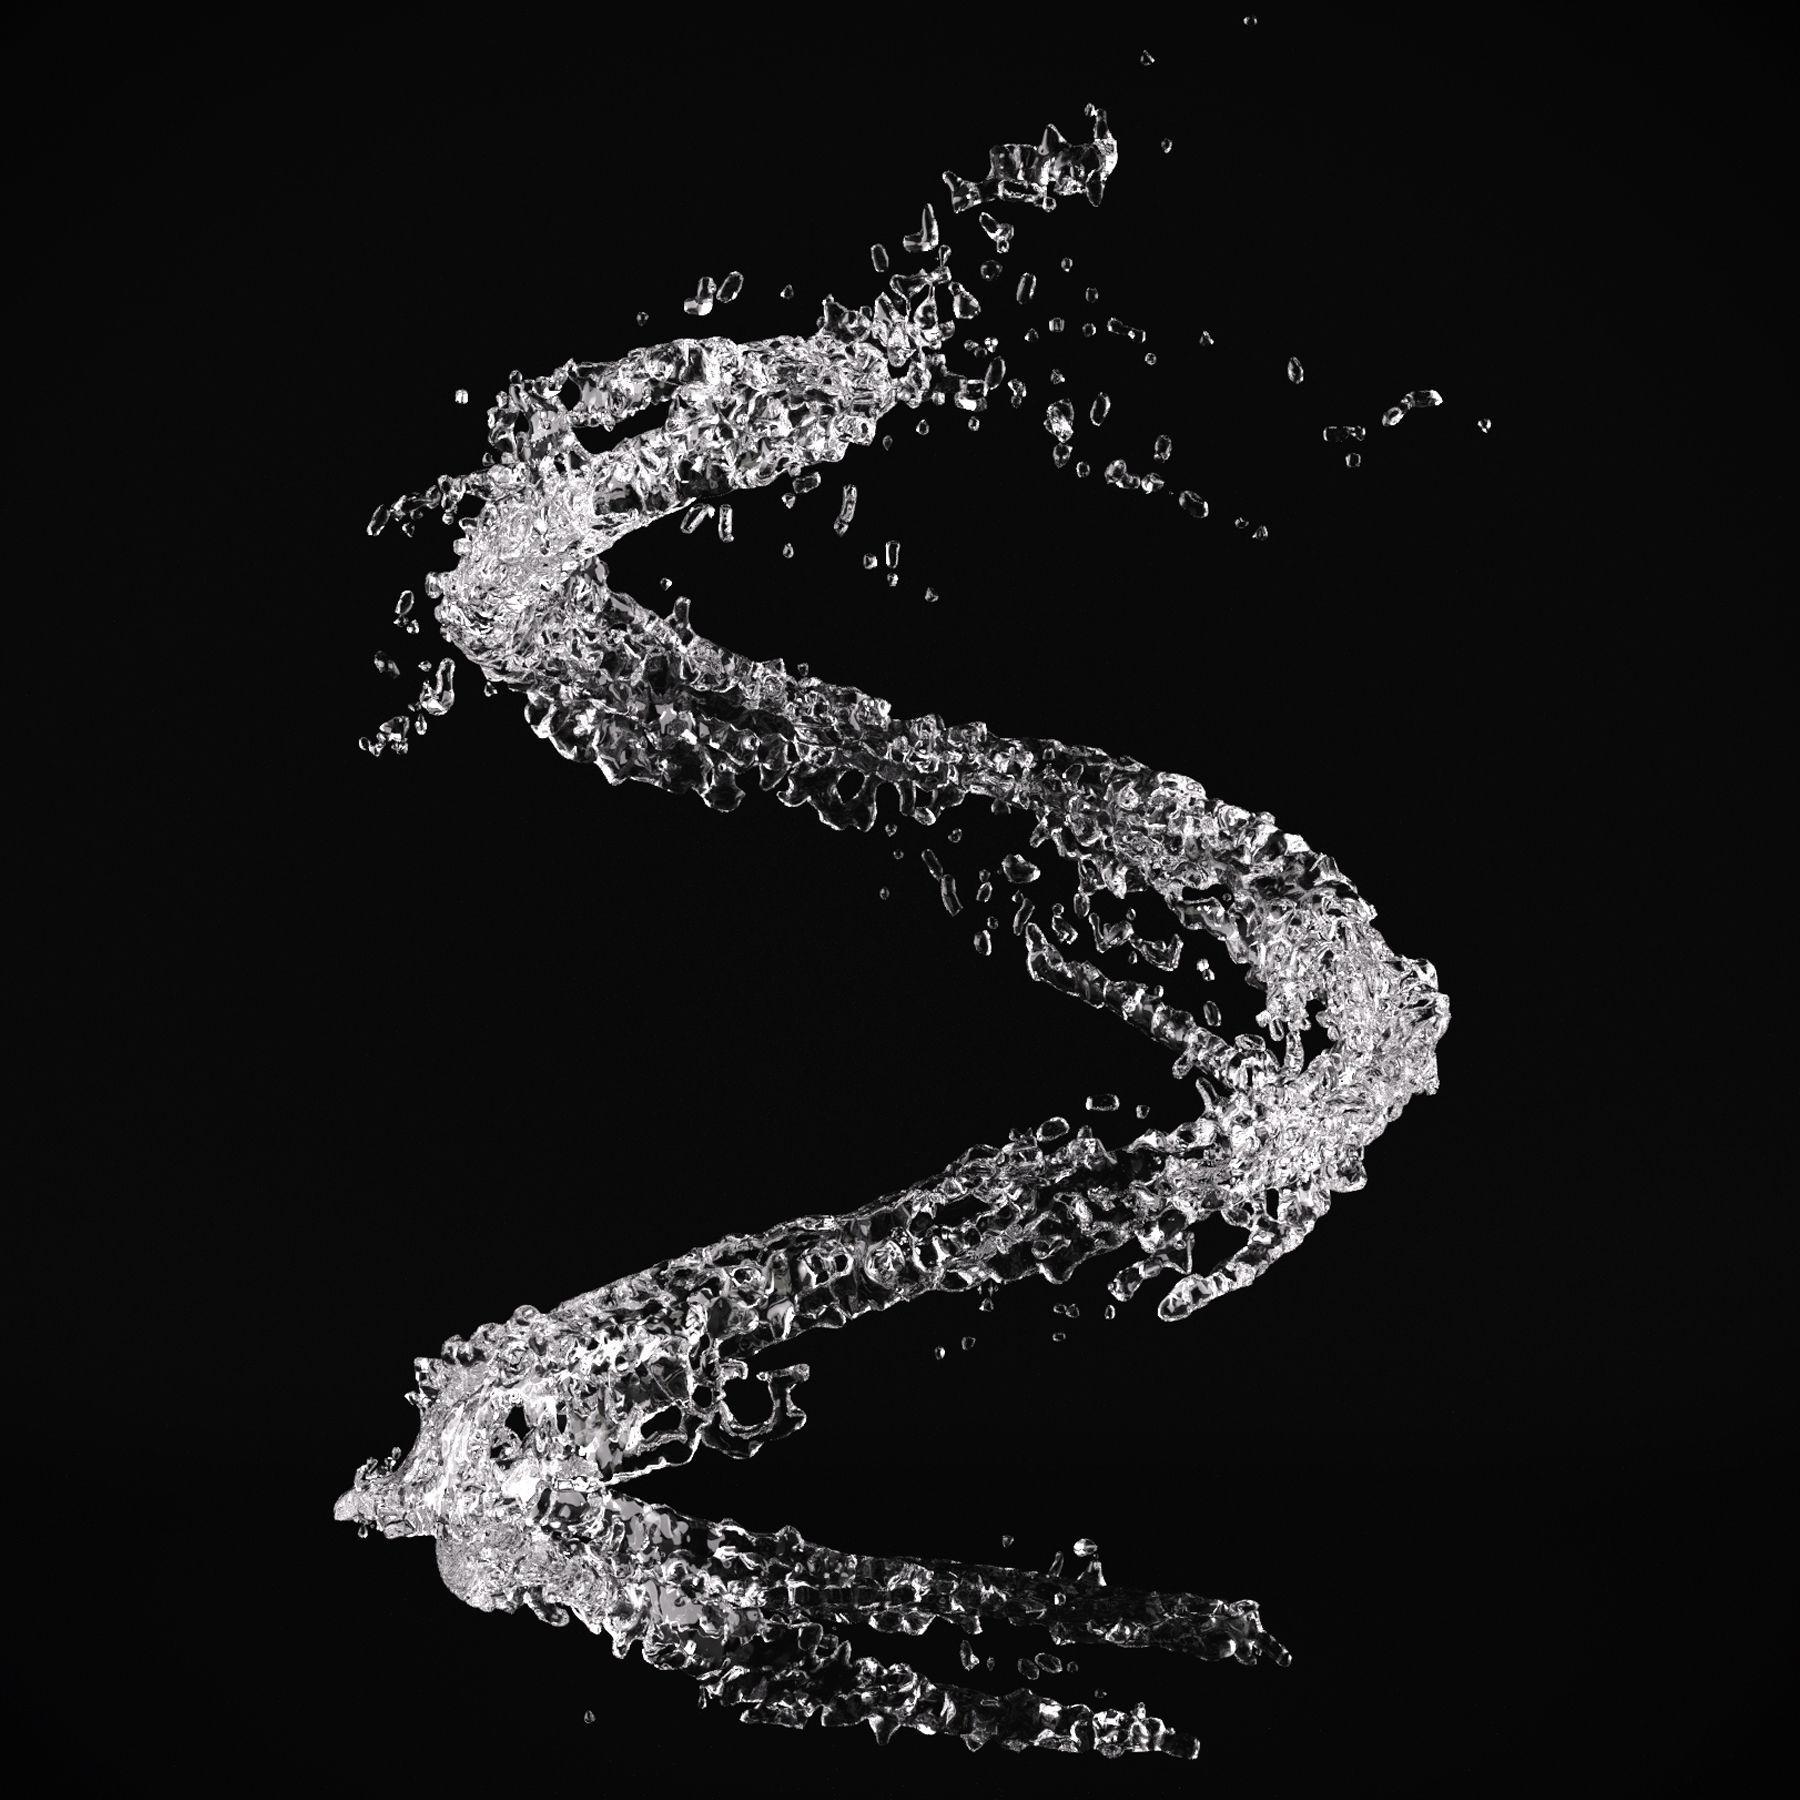 Water Splash 01